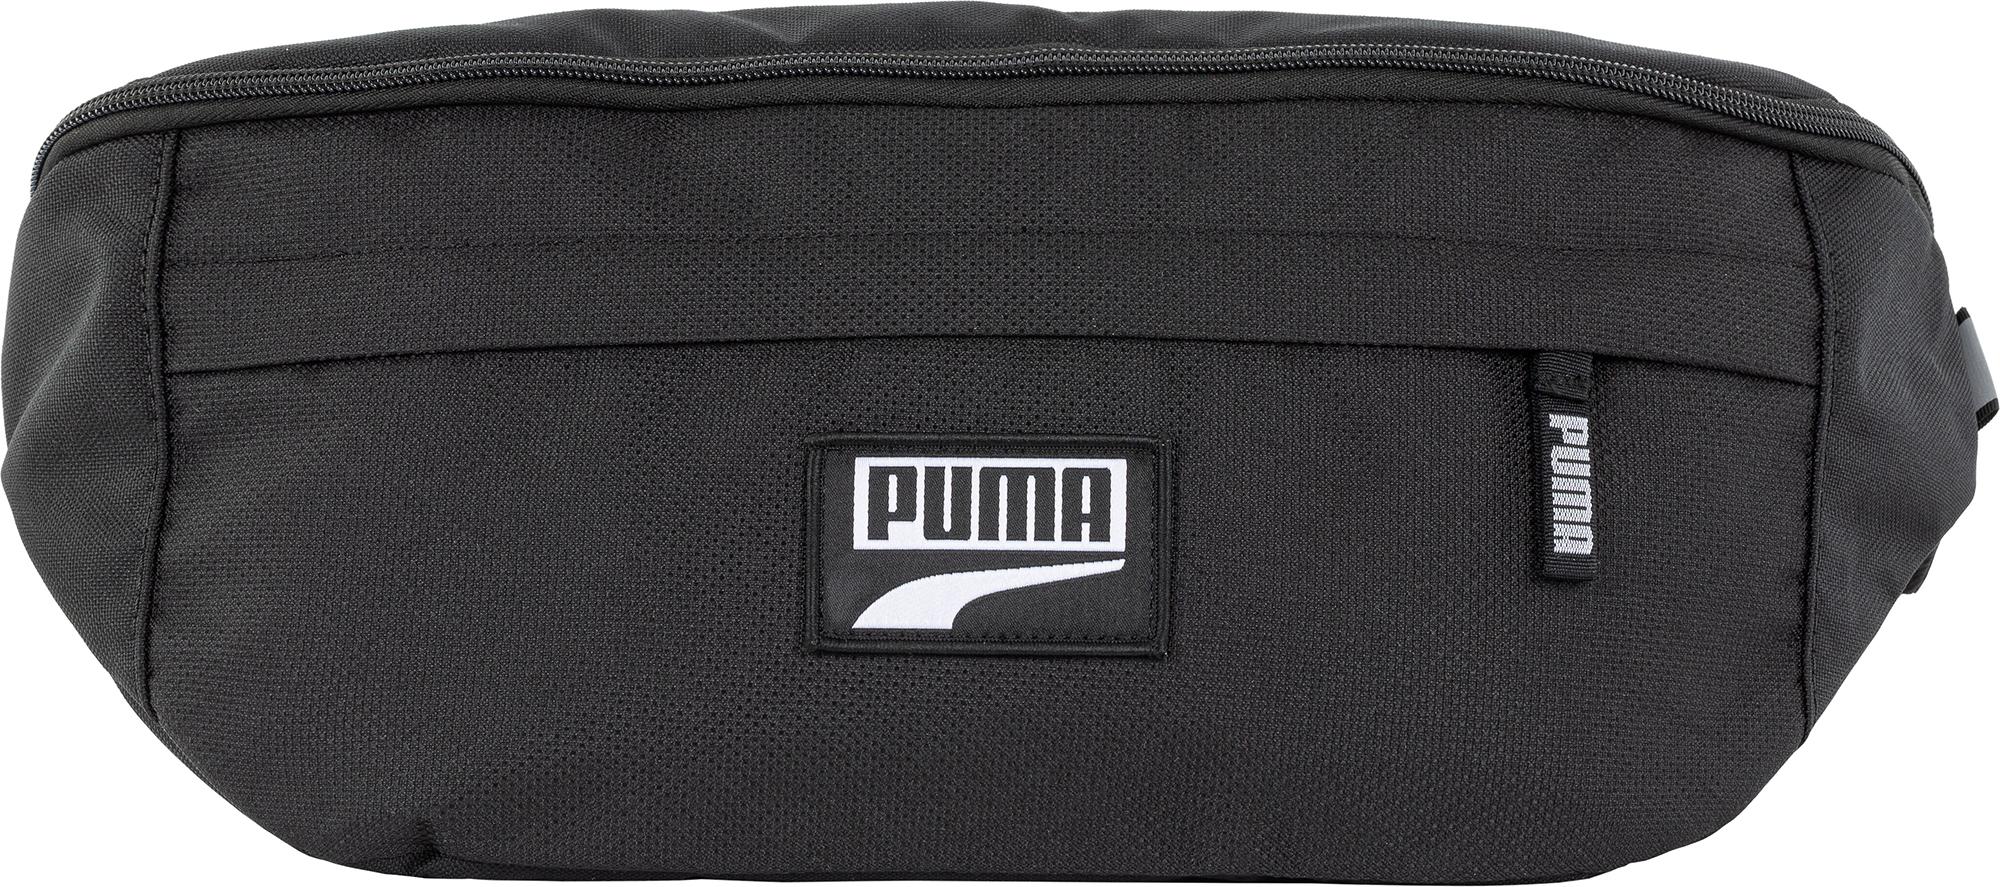 цены PUMA Сумка Puma Deck Waist Bag XL